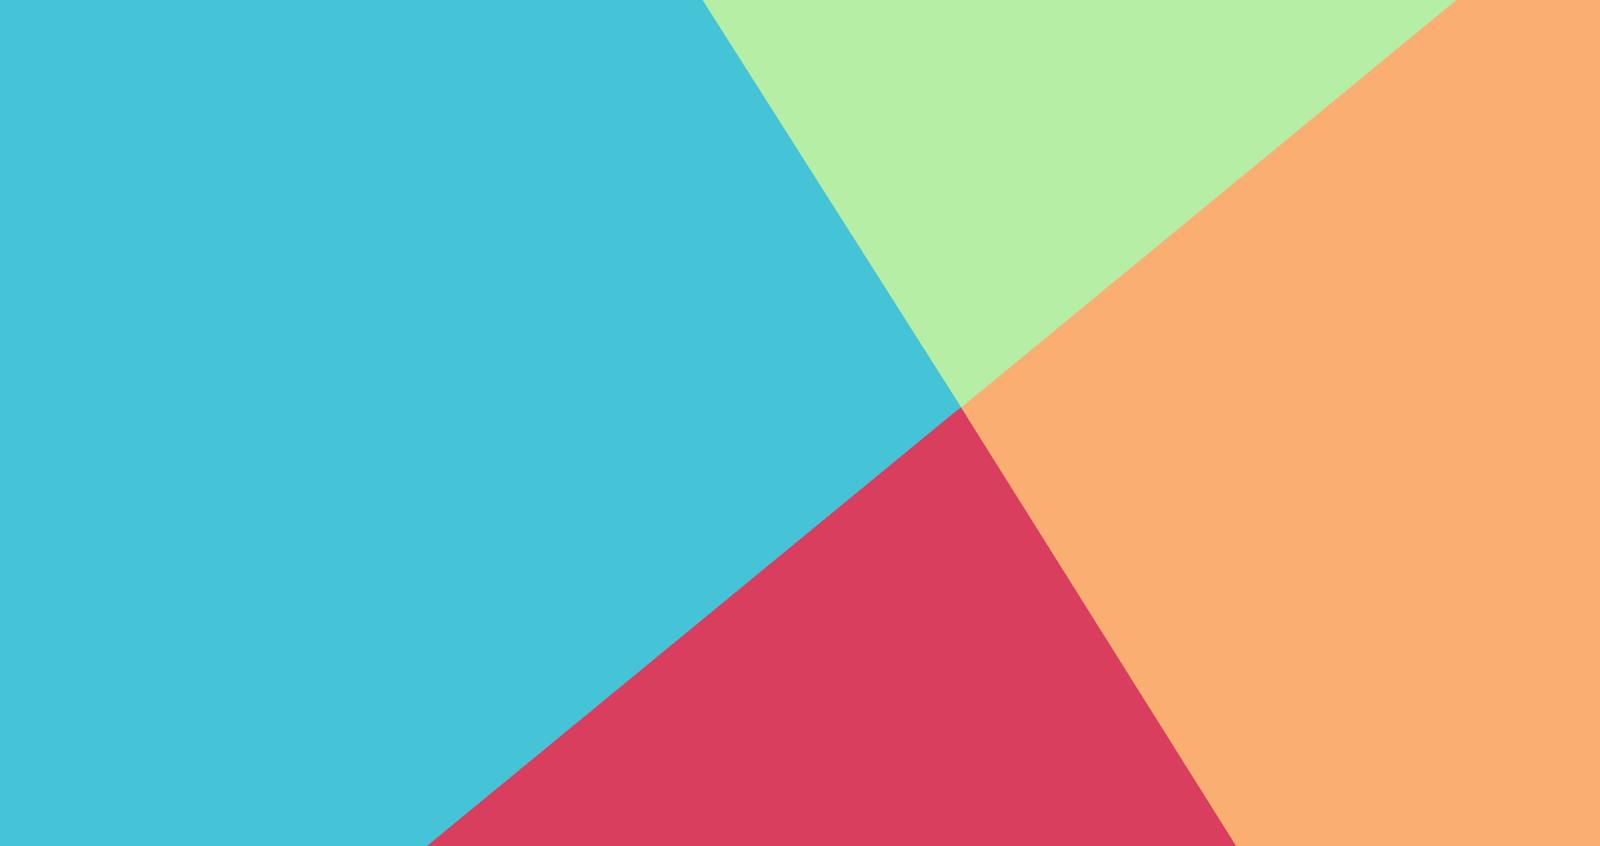 7 aplikasi wallpaper terbaik untuk android bali developer wallpapers wallpapers by google voltagebd Choice Image